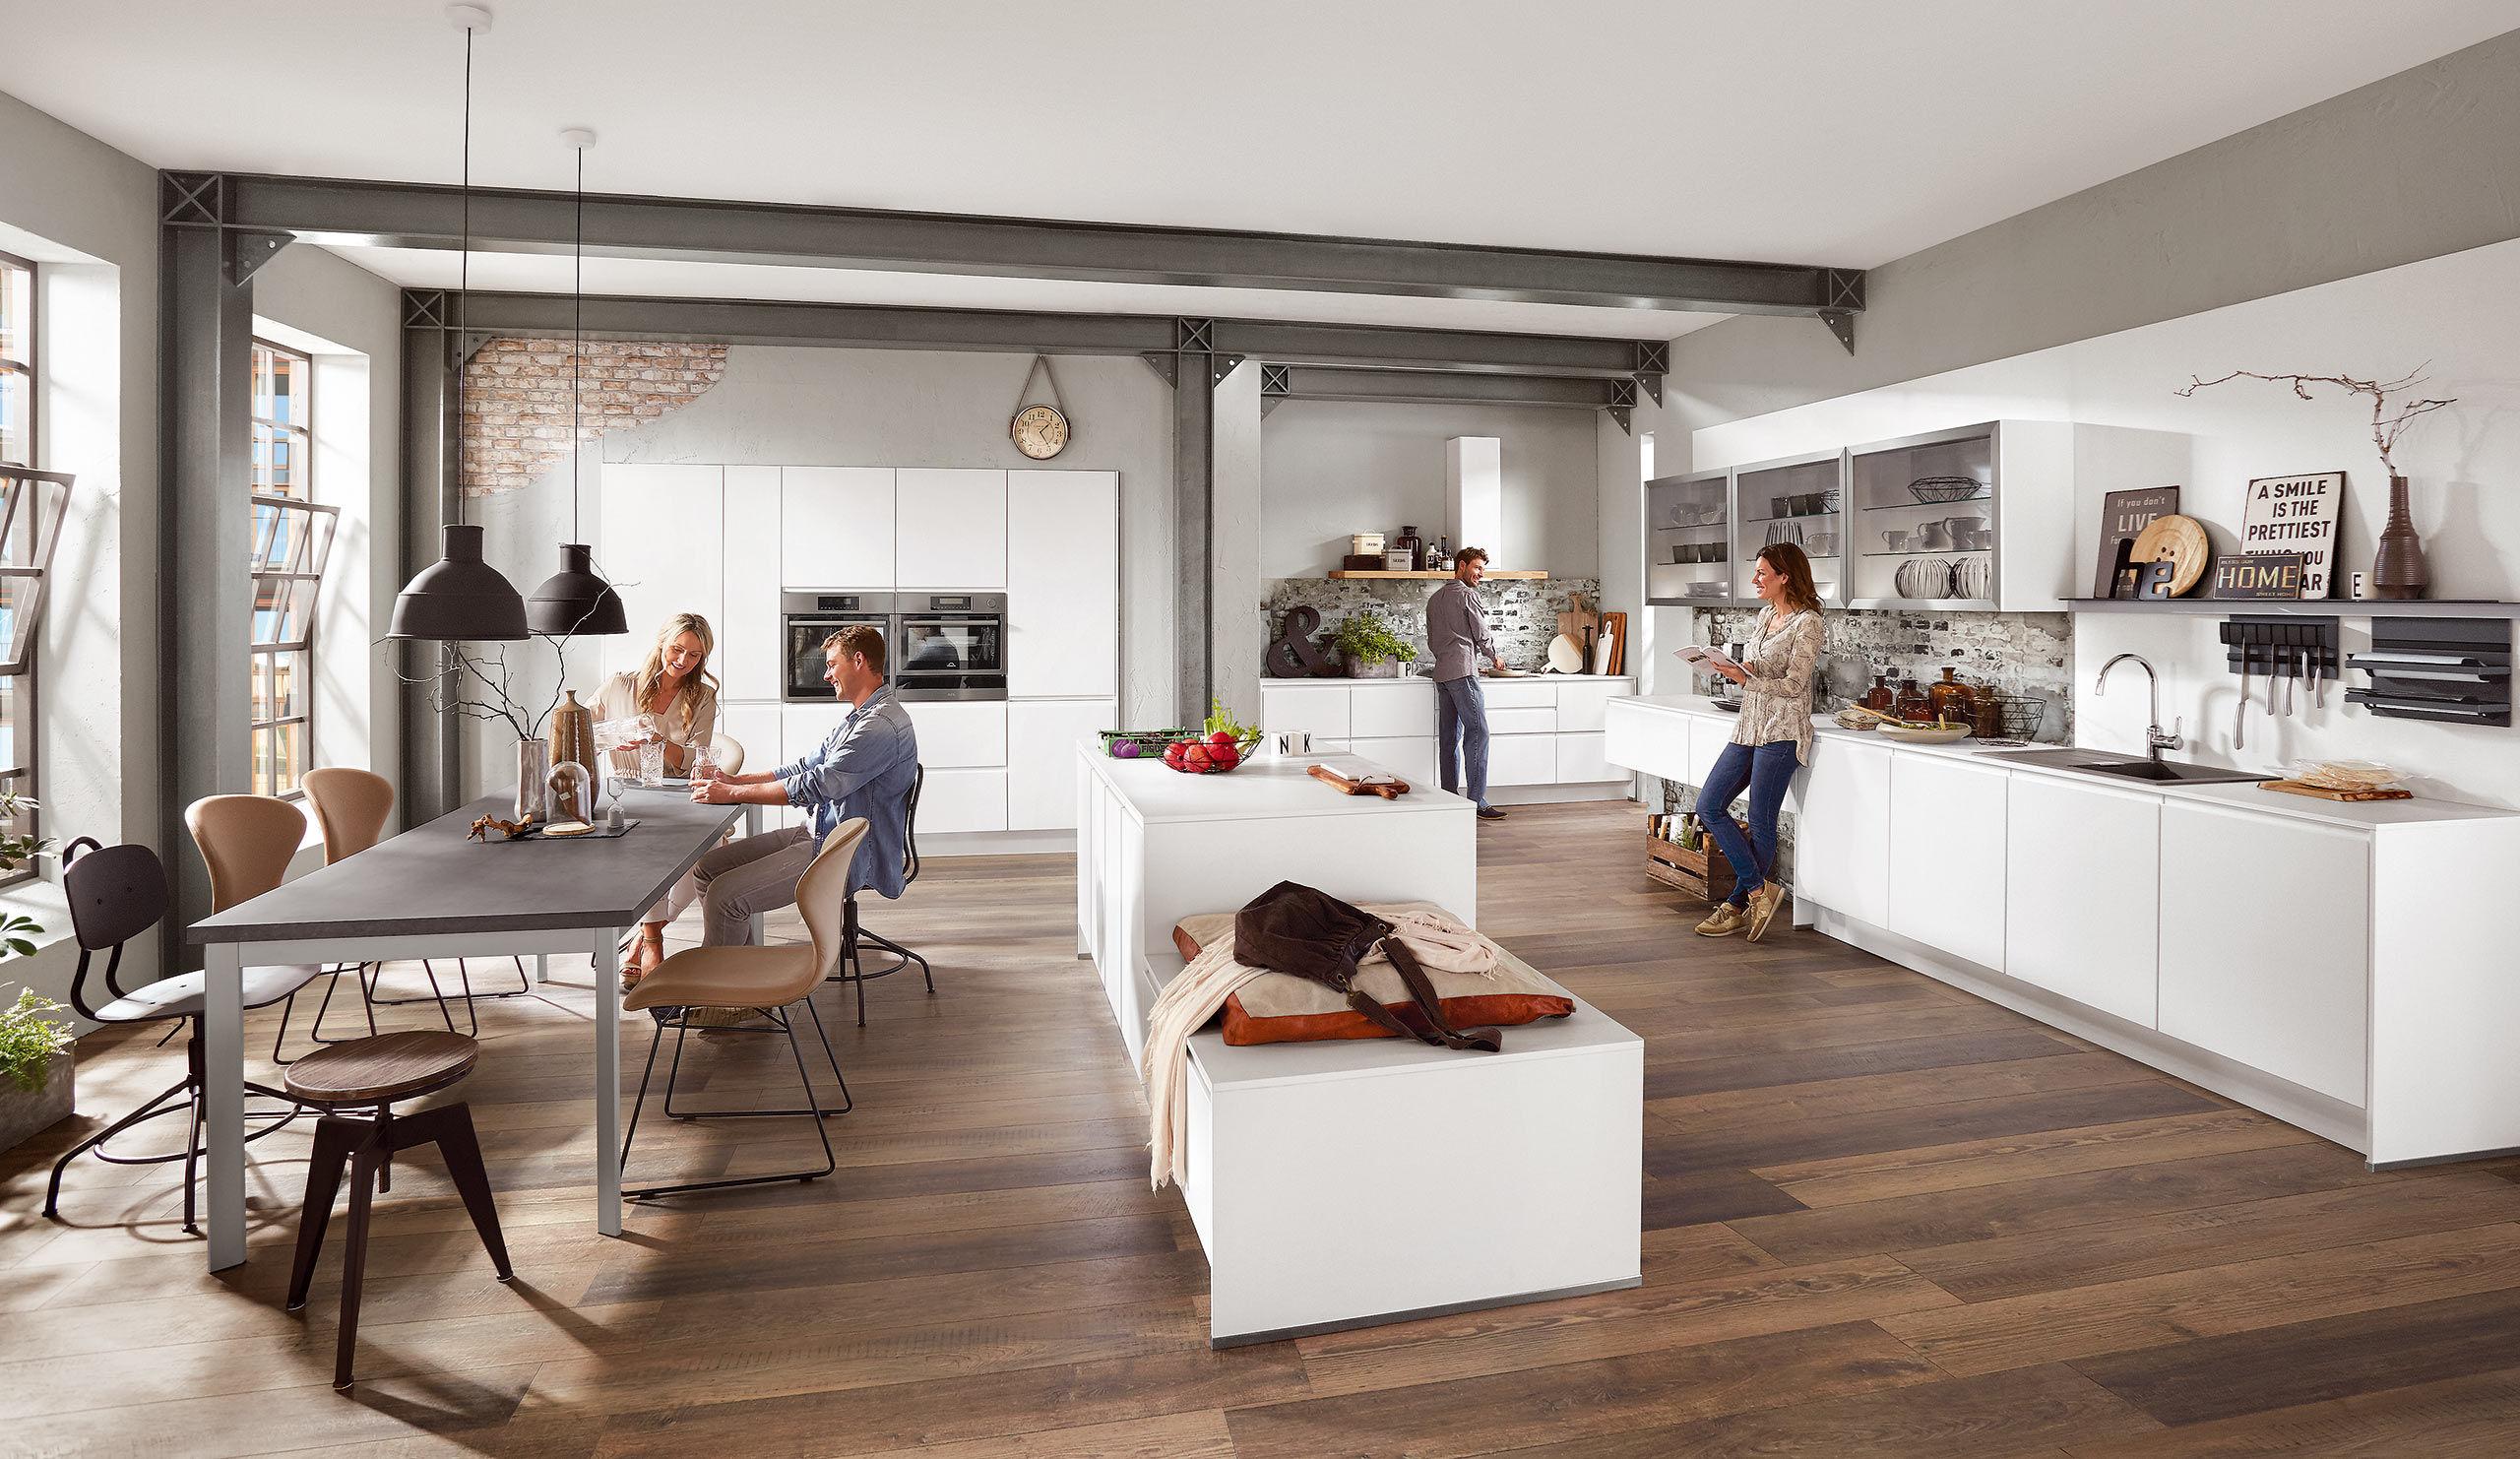 Full Size of Ikea Küche Planen Lassen Kosten Deckenbeleuchtung Küche Planen Küche Planen Software Online Küche Planen Und Kaufen Küche Küche Planen